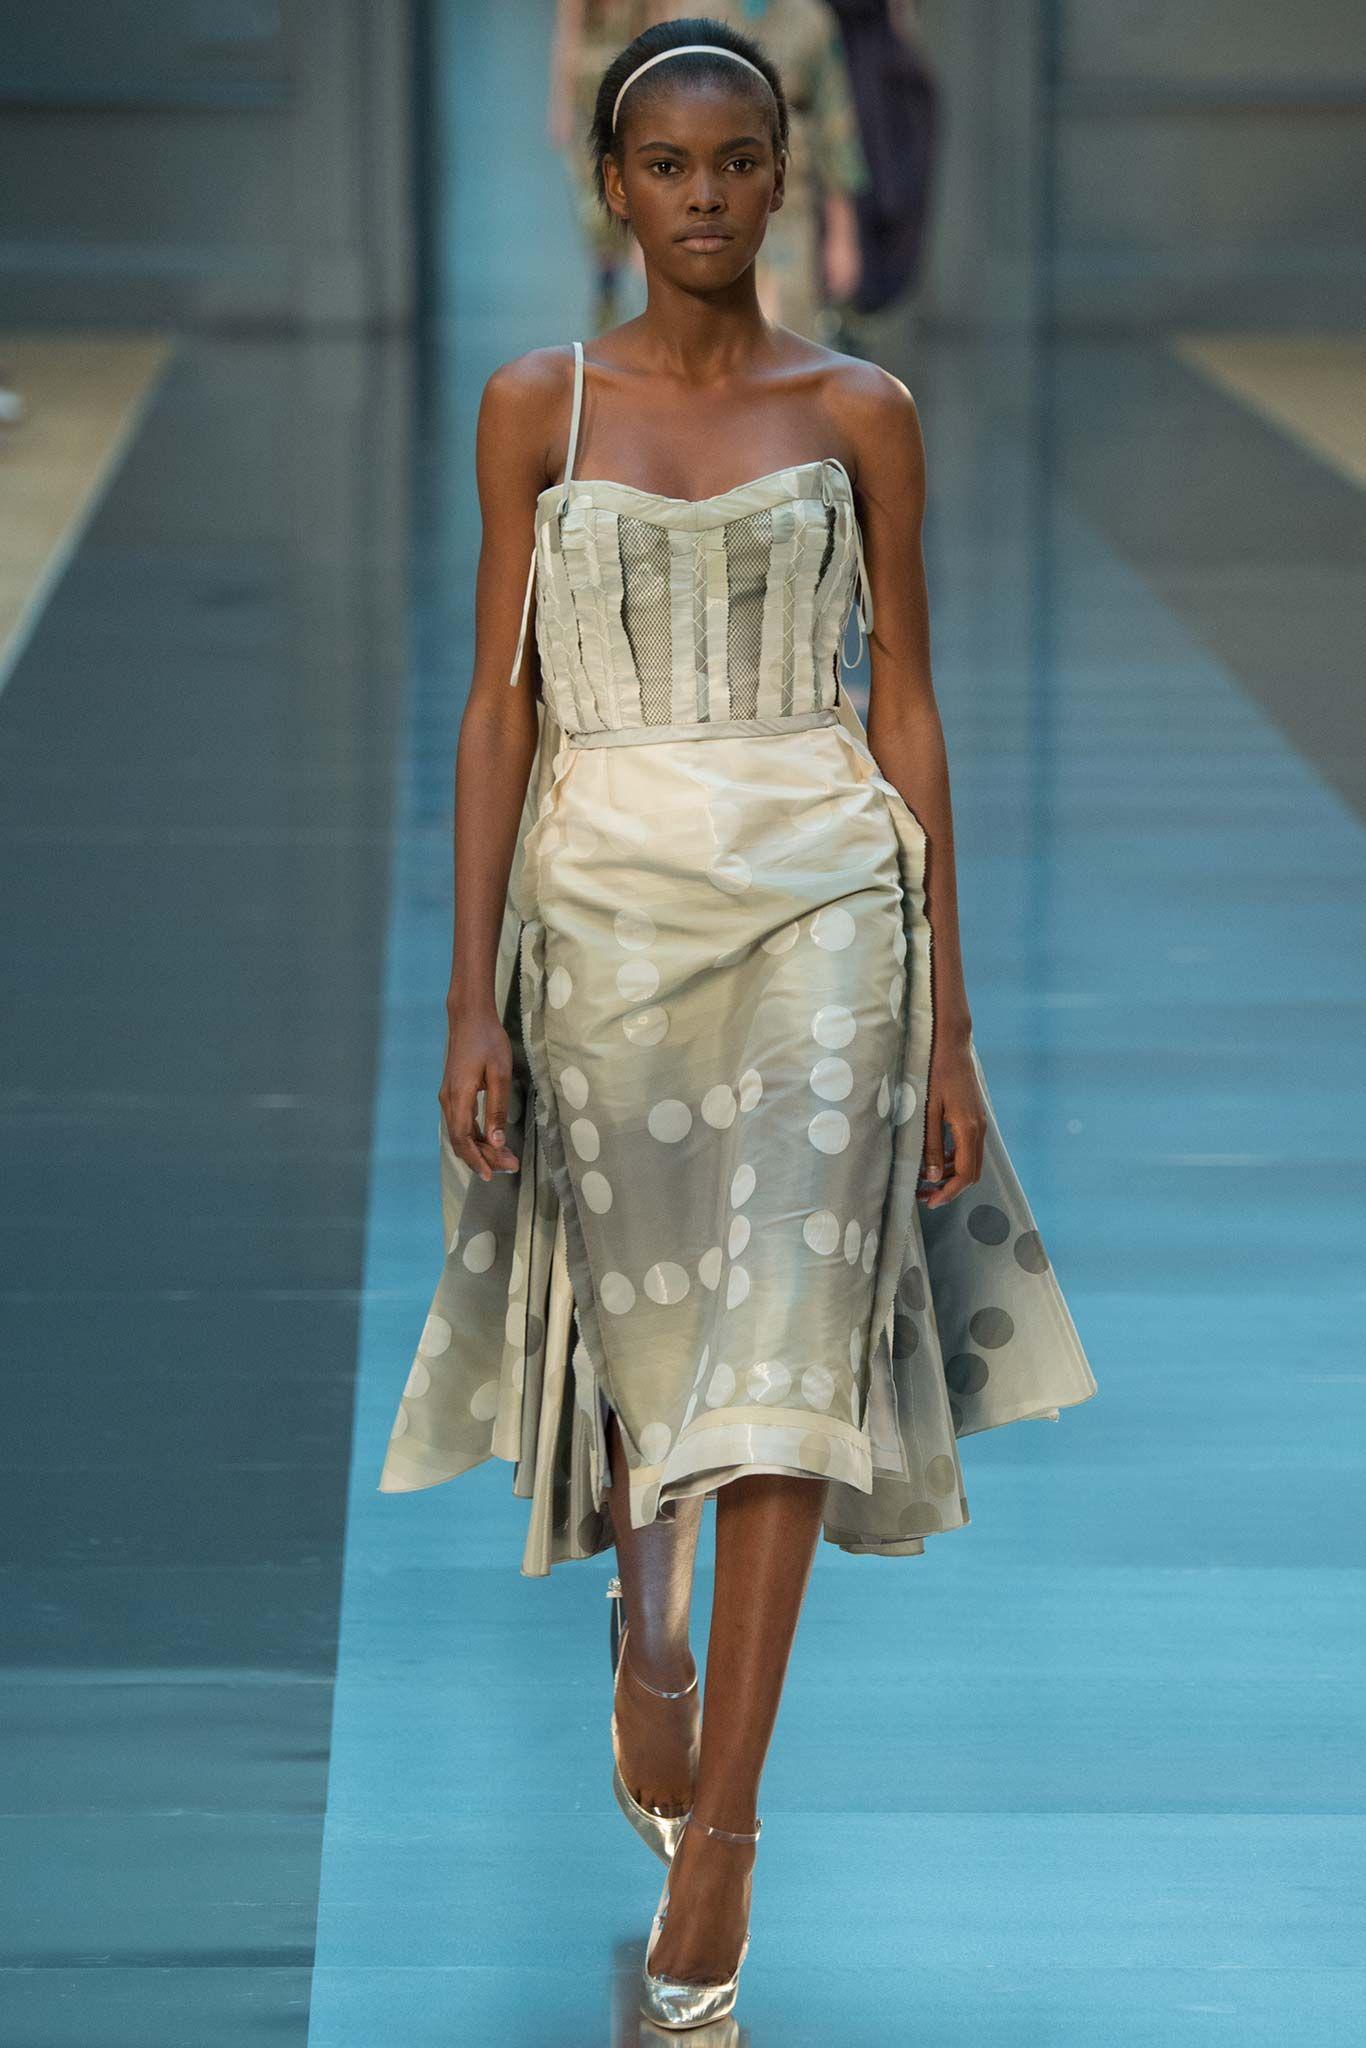 John Galliano for Maison Margiela F/W 2015 Artisanal ,Look 17, Model Amilna Estevão (Elite)